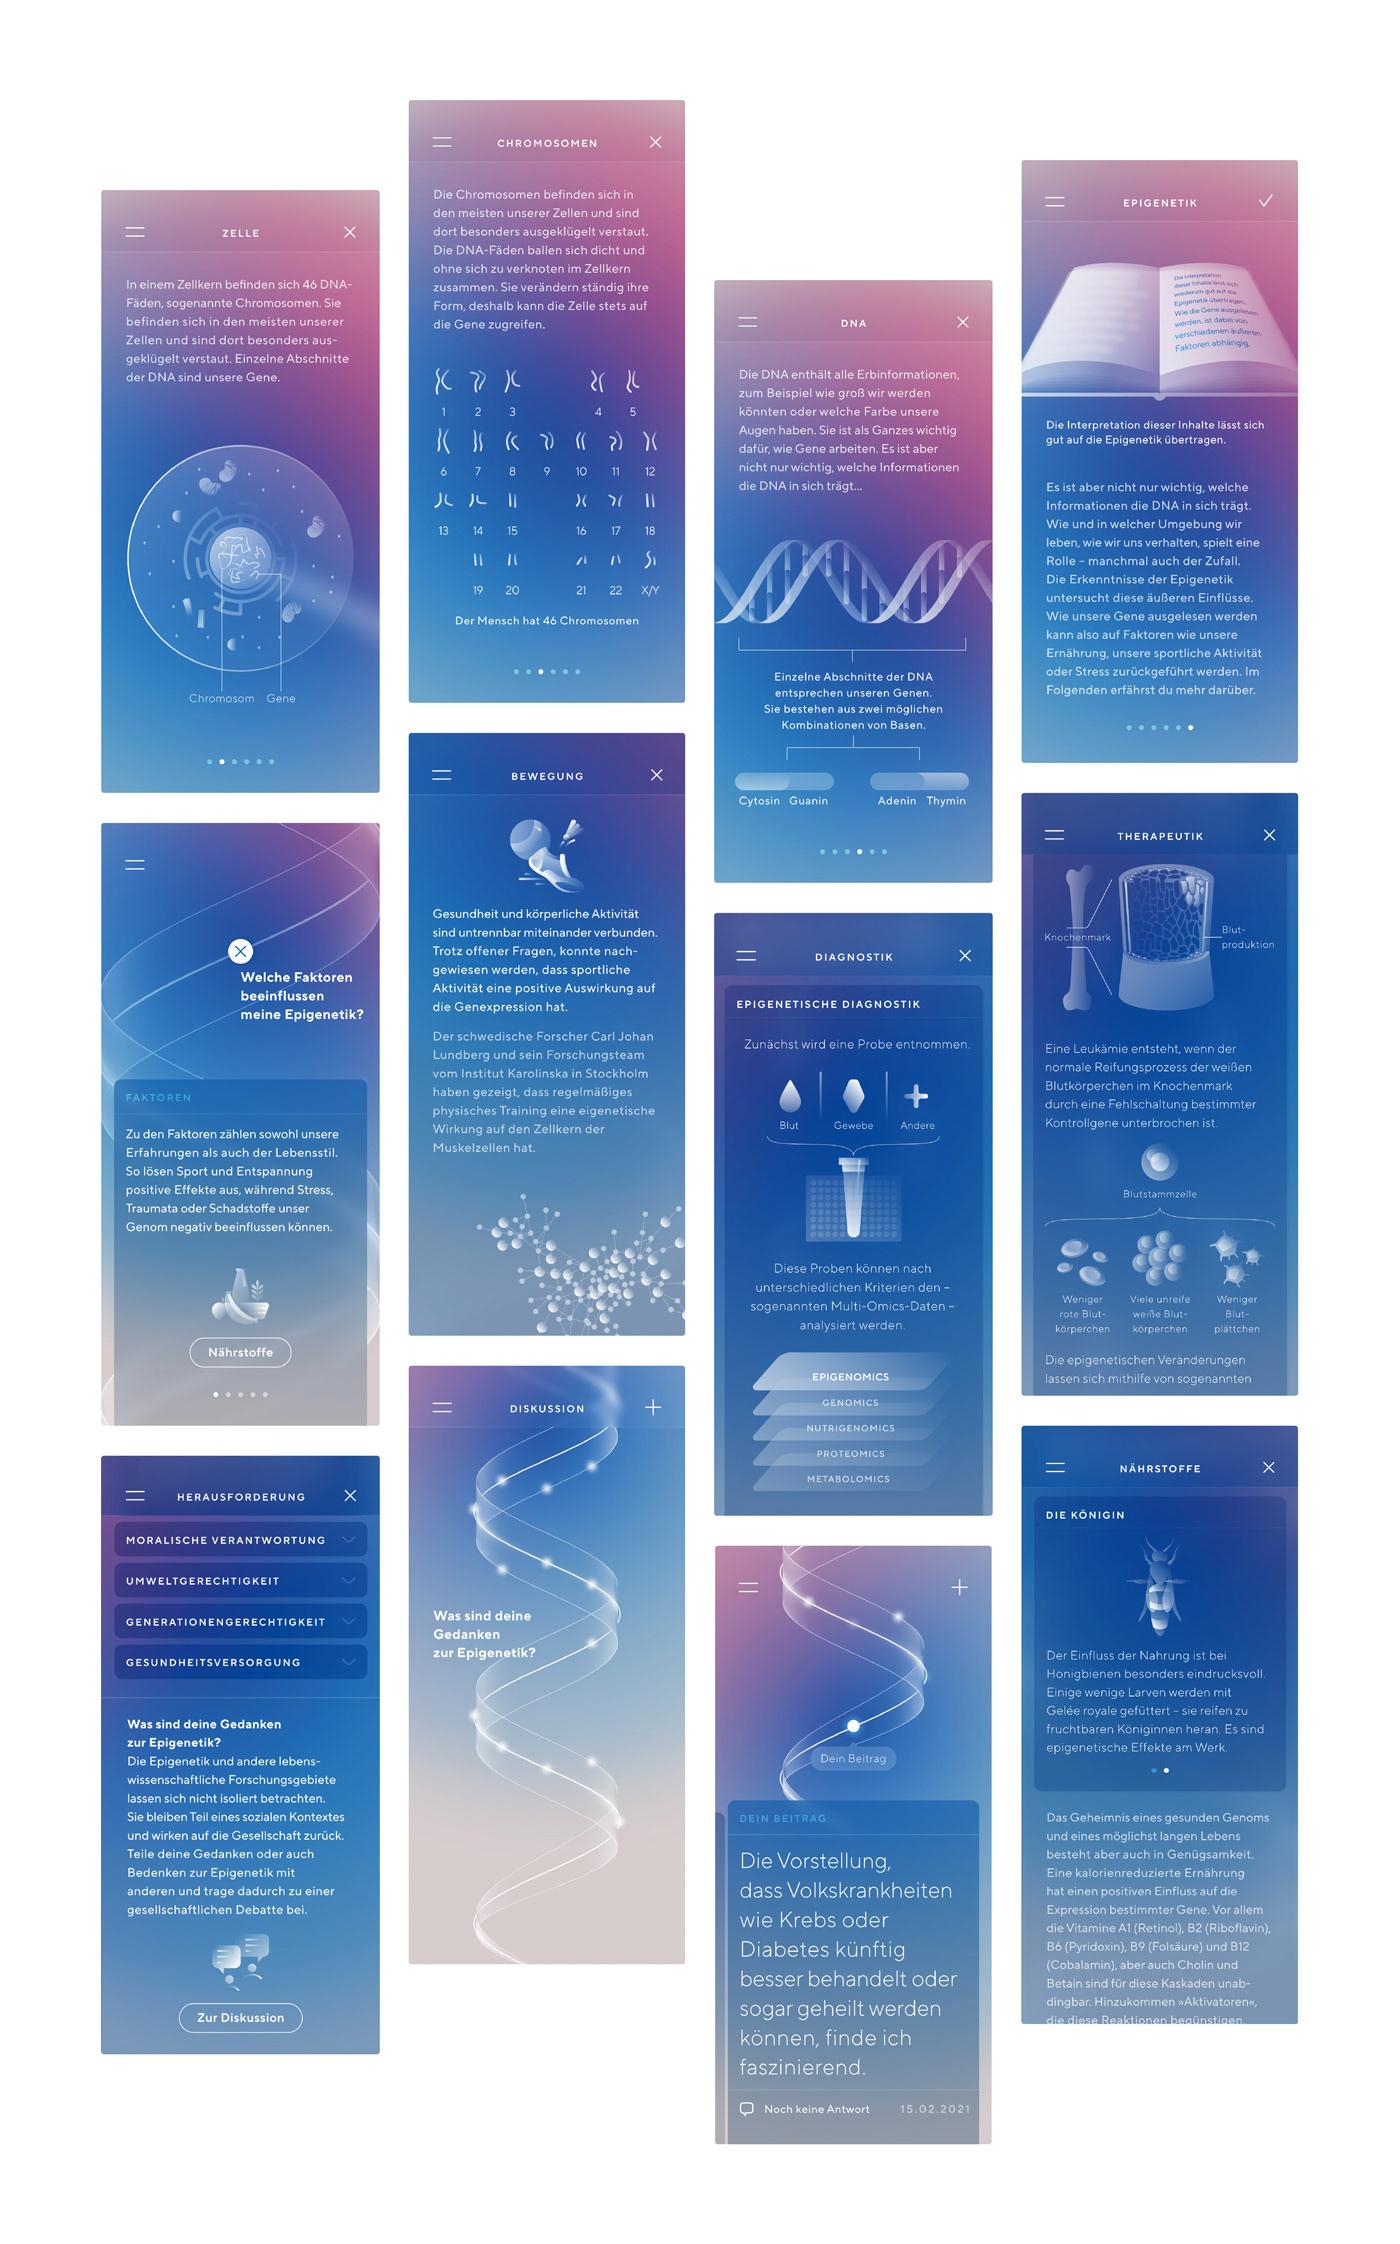 biomedicine data visualization Epigenetics future medicine genetics health care infographics Life Sciences medicine motion tracking